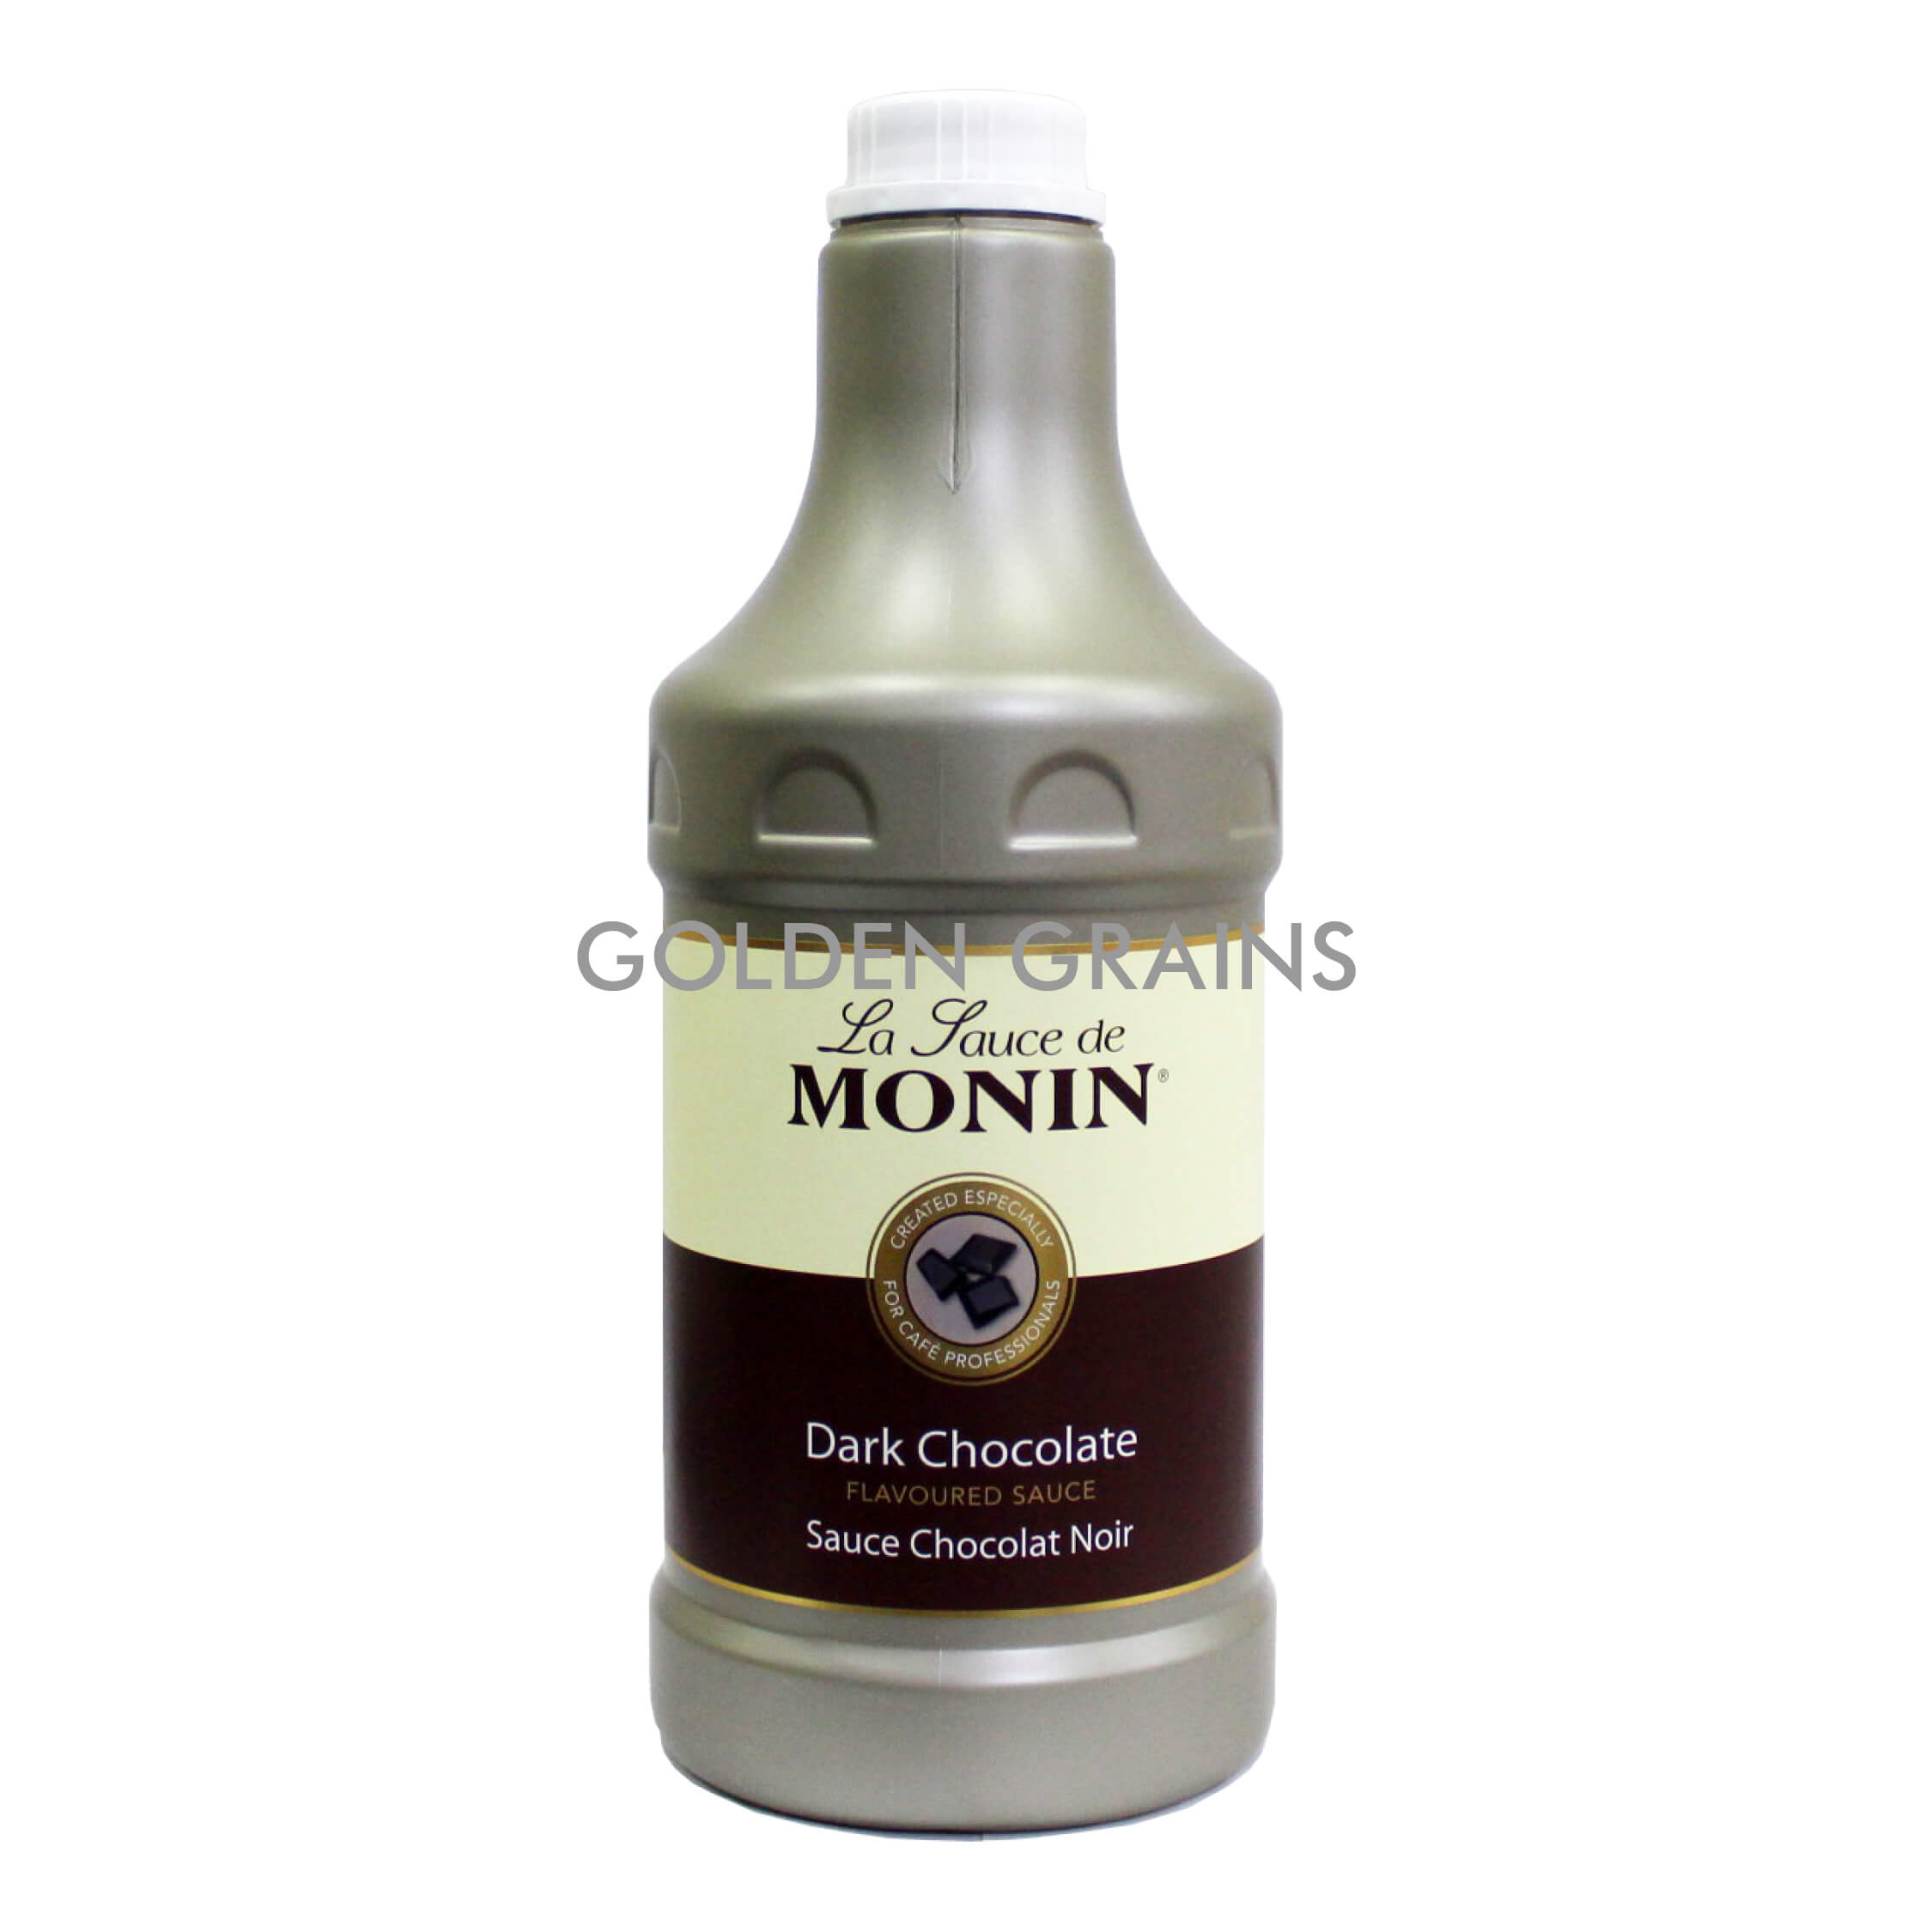 Golden Grains - Monin - Dark Chocolate Sauce FR - Front.jpg